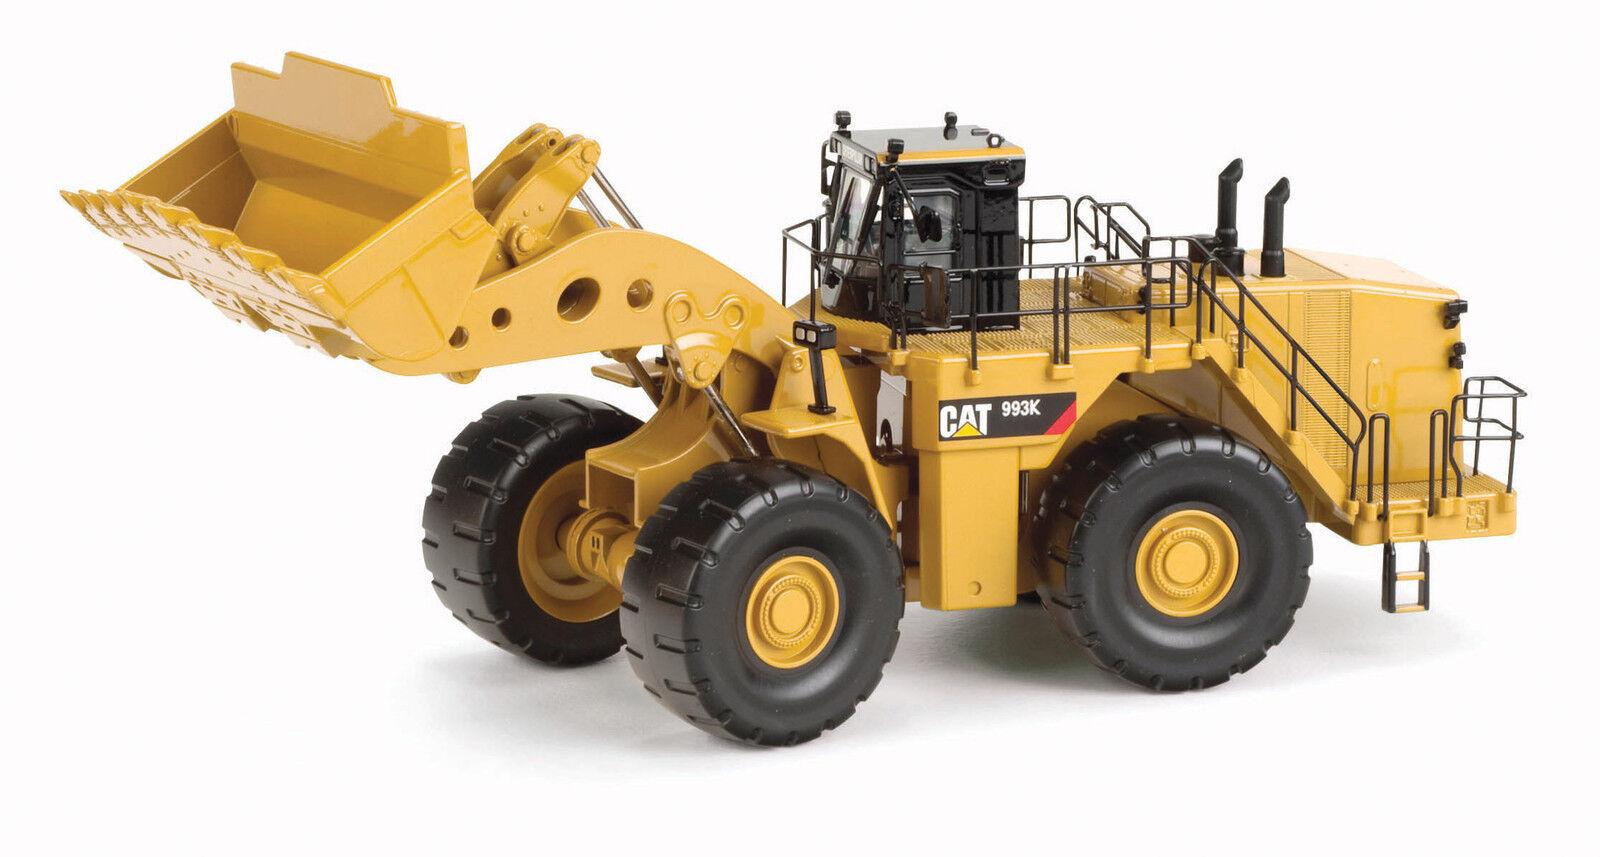 Caterpillar 1 50 scale Cat 993K Wheel Loader Diecast replica Norscot 55257